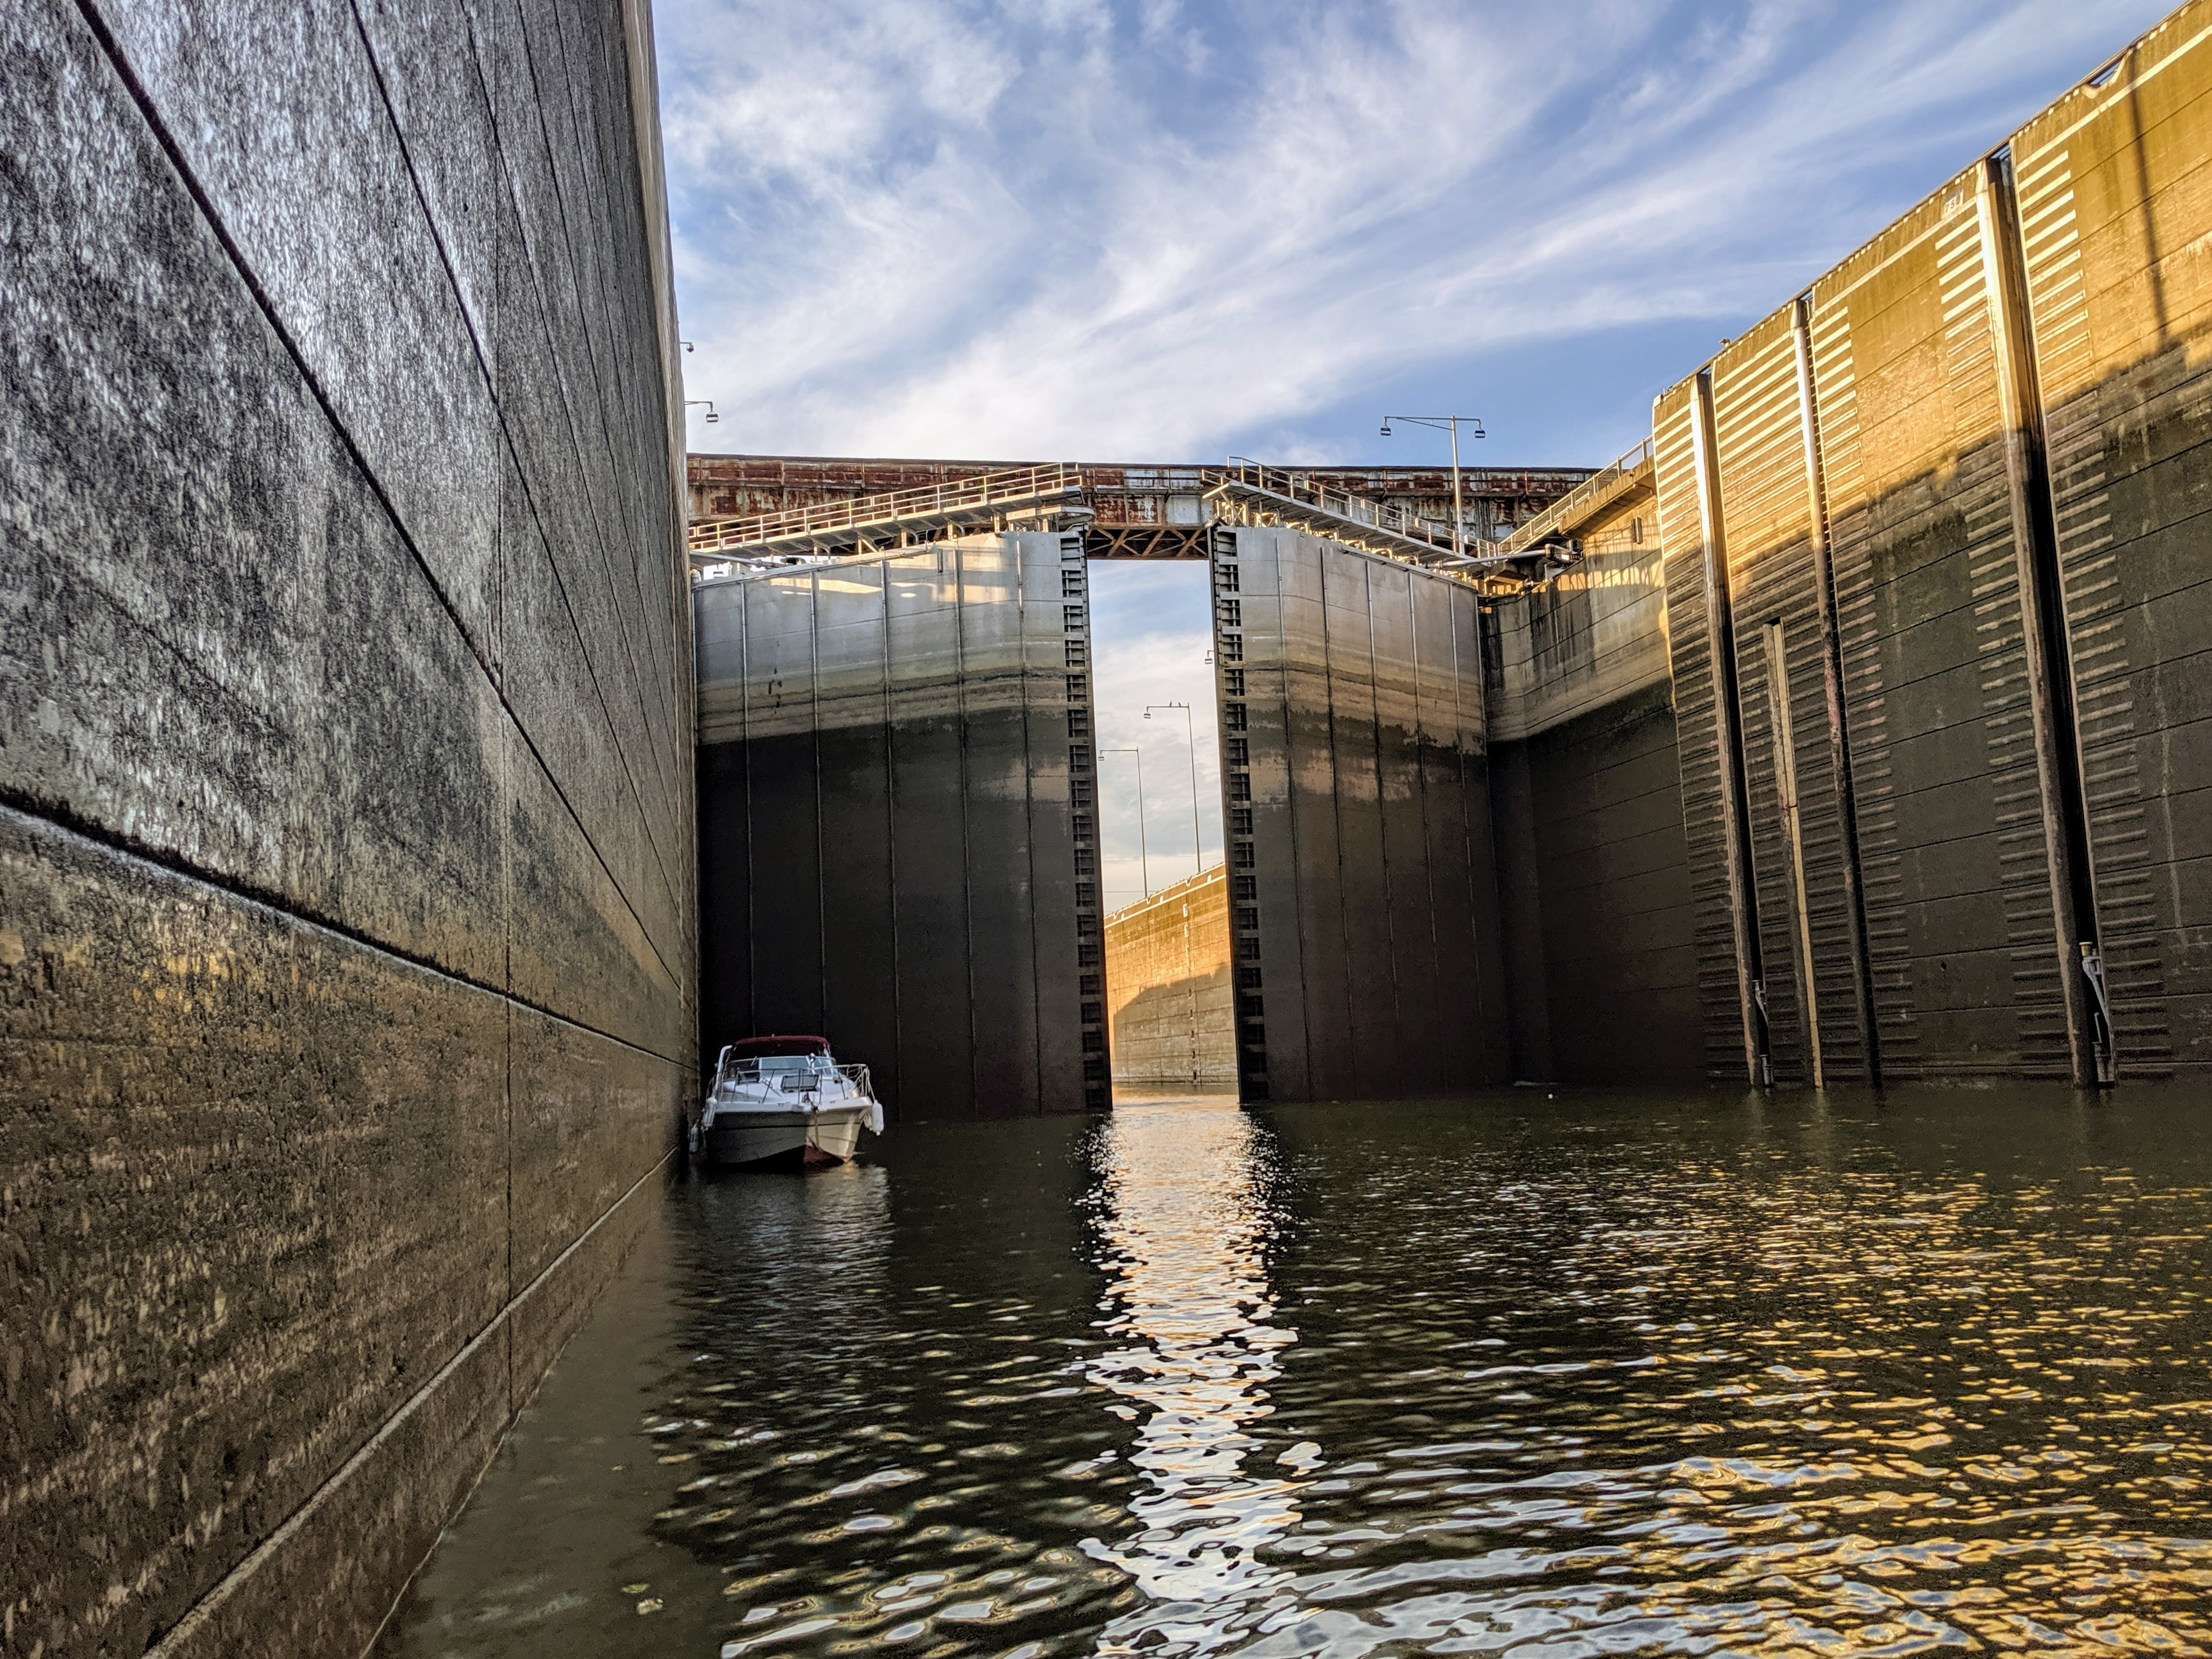 Barkley Lock & Dam